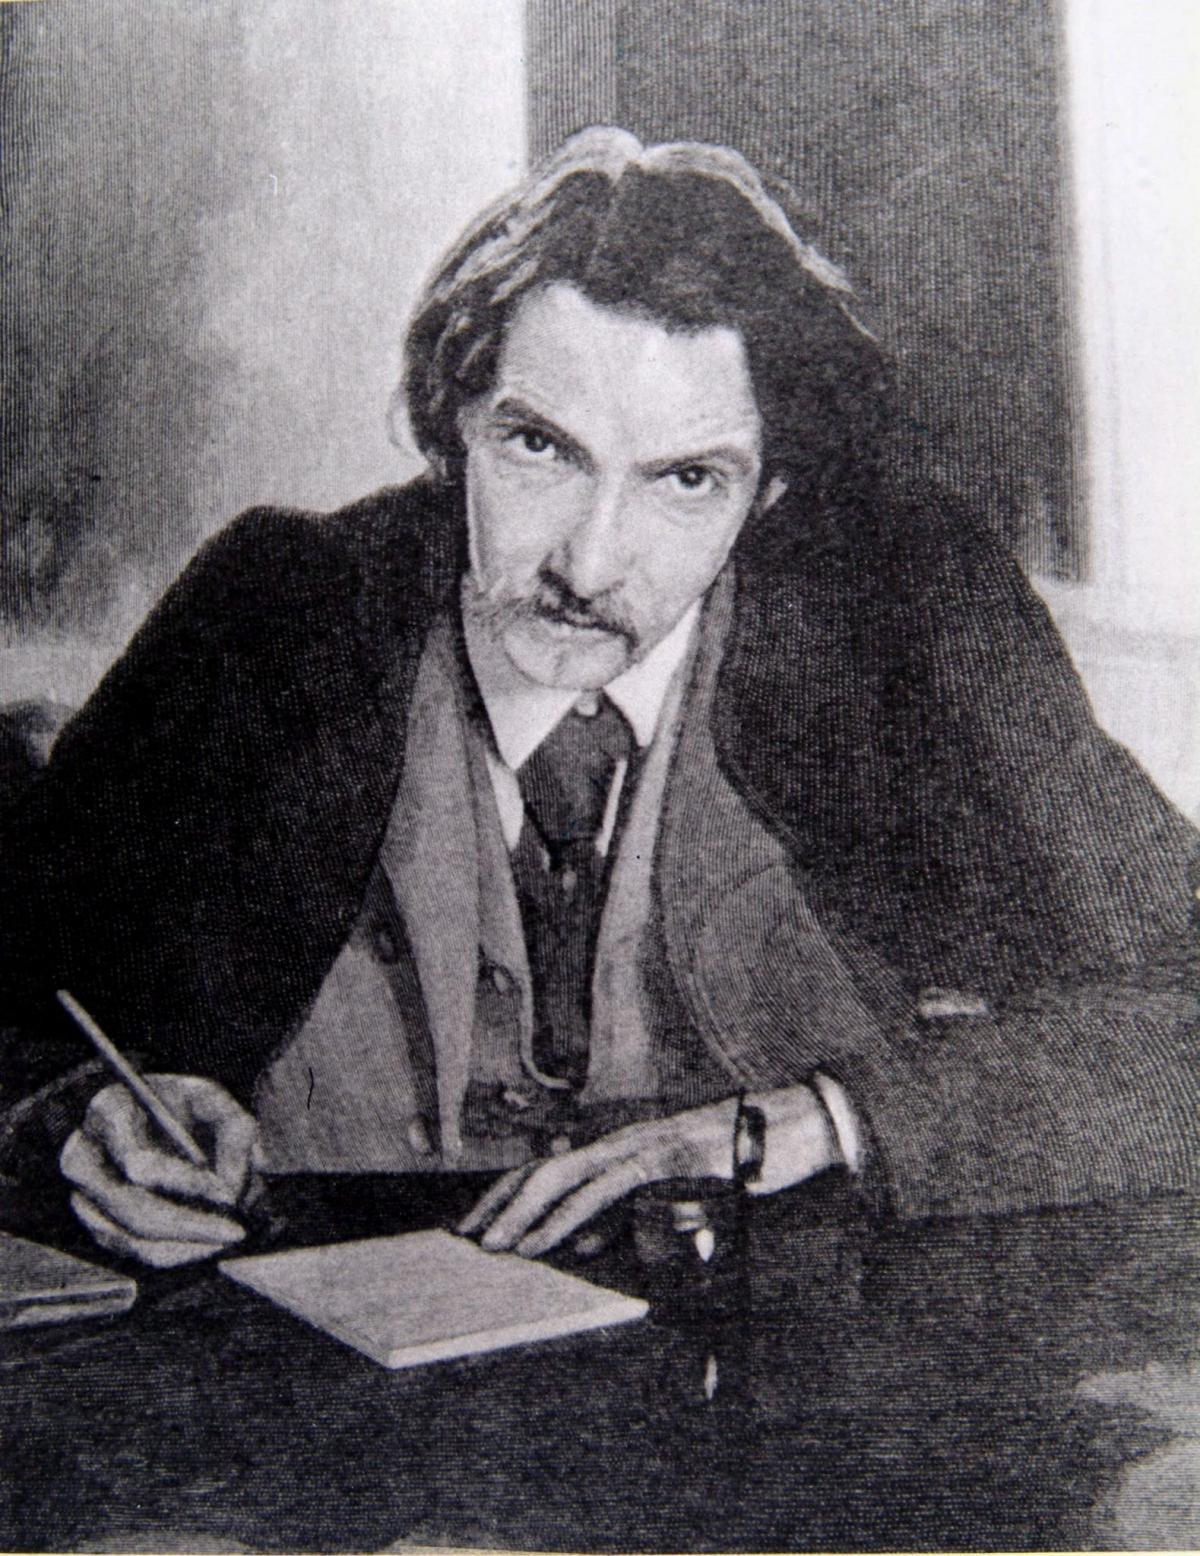 Heart broken letter of Robert Louis Stevenson's wife written